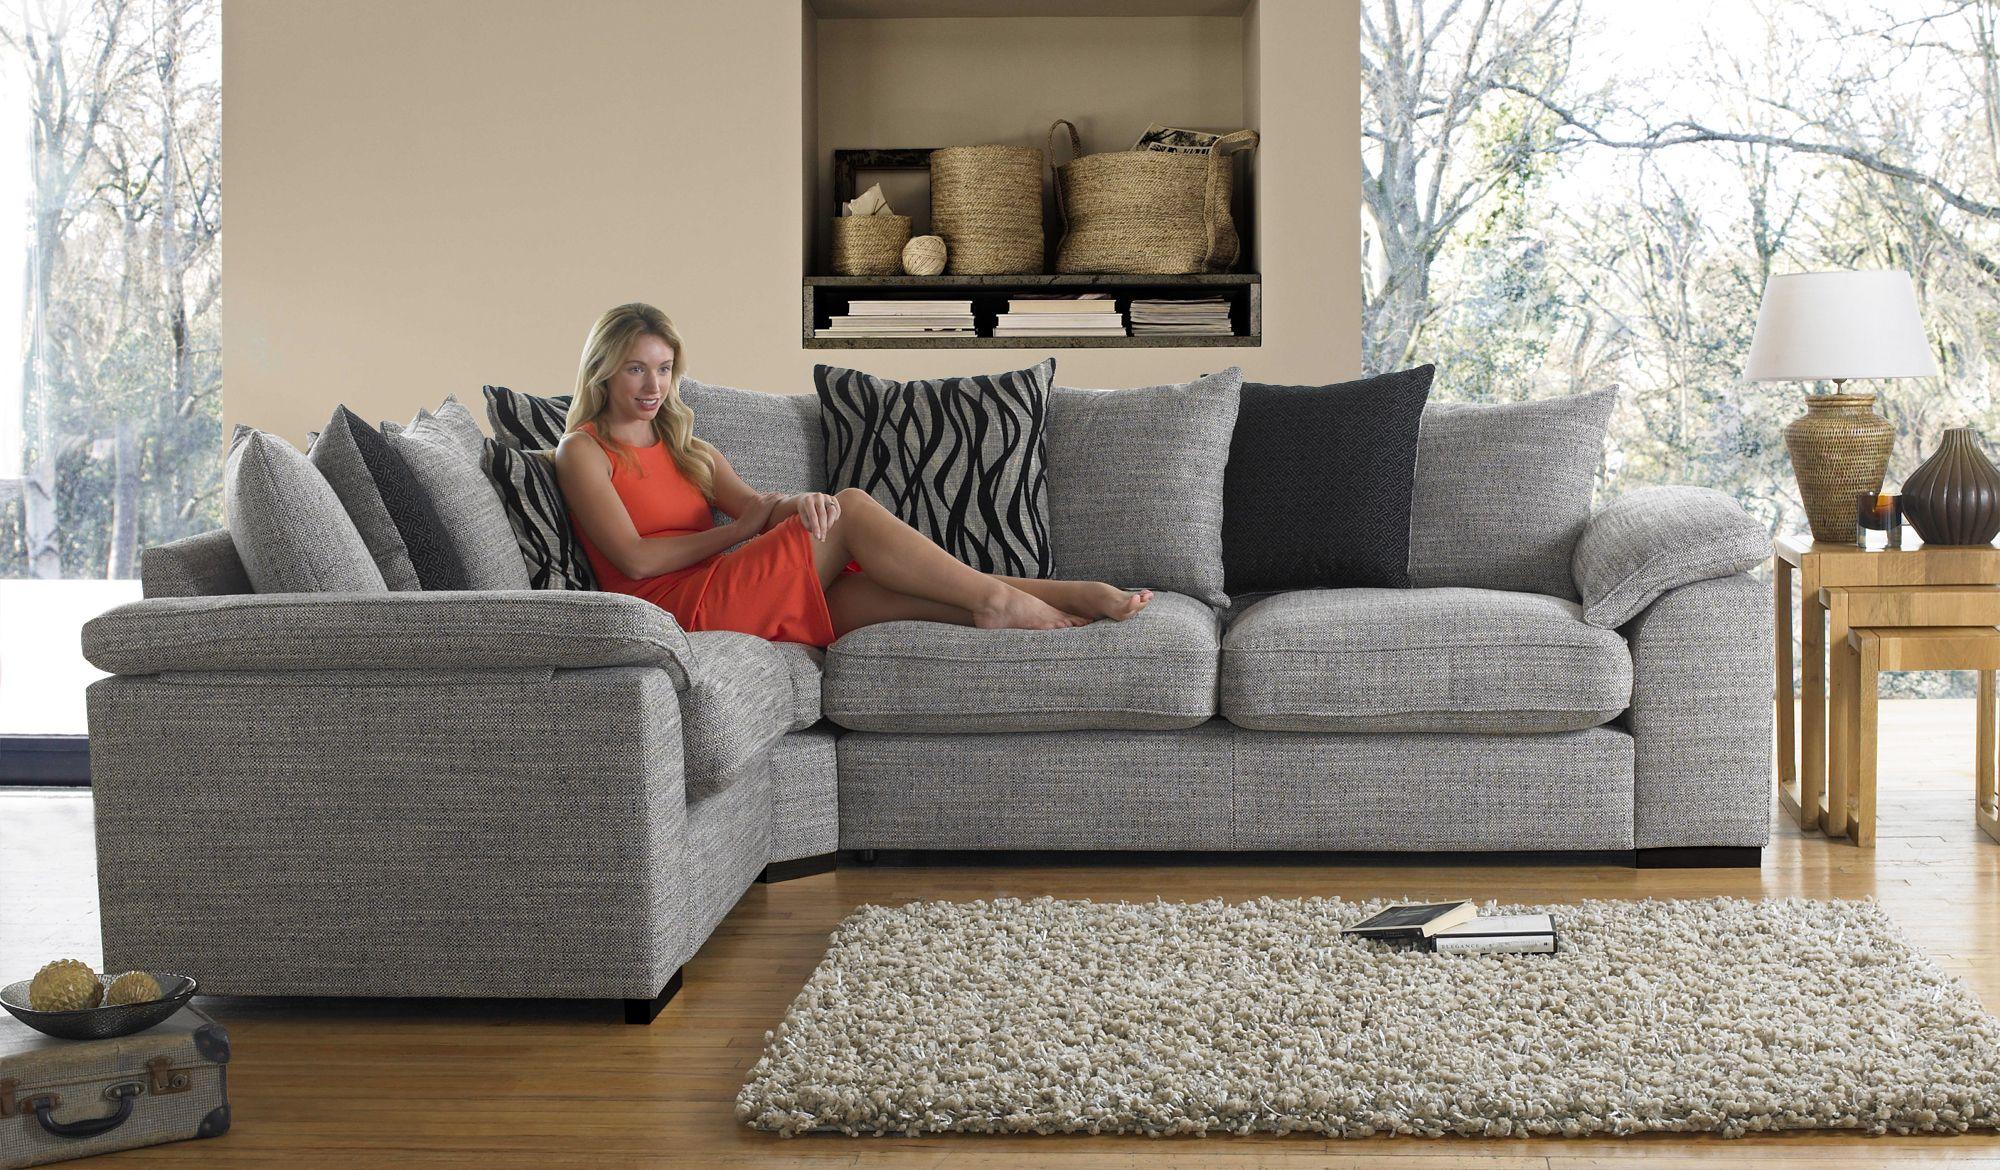 Whisper Sofa At Sofa Worldcouk Love This Colour And Corner Sofa